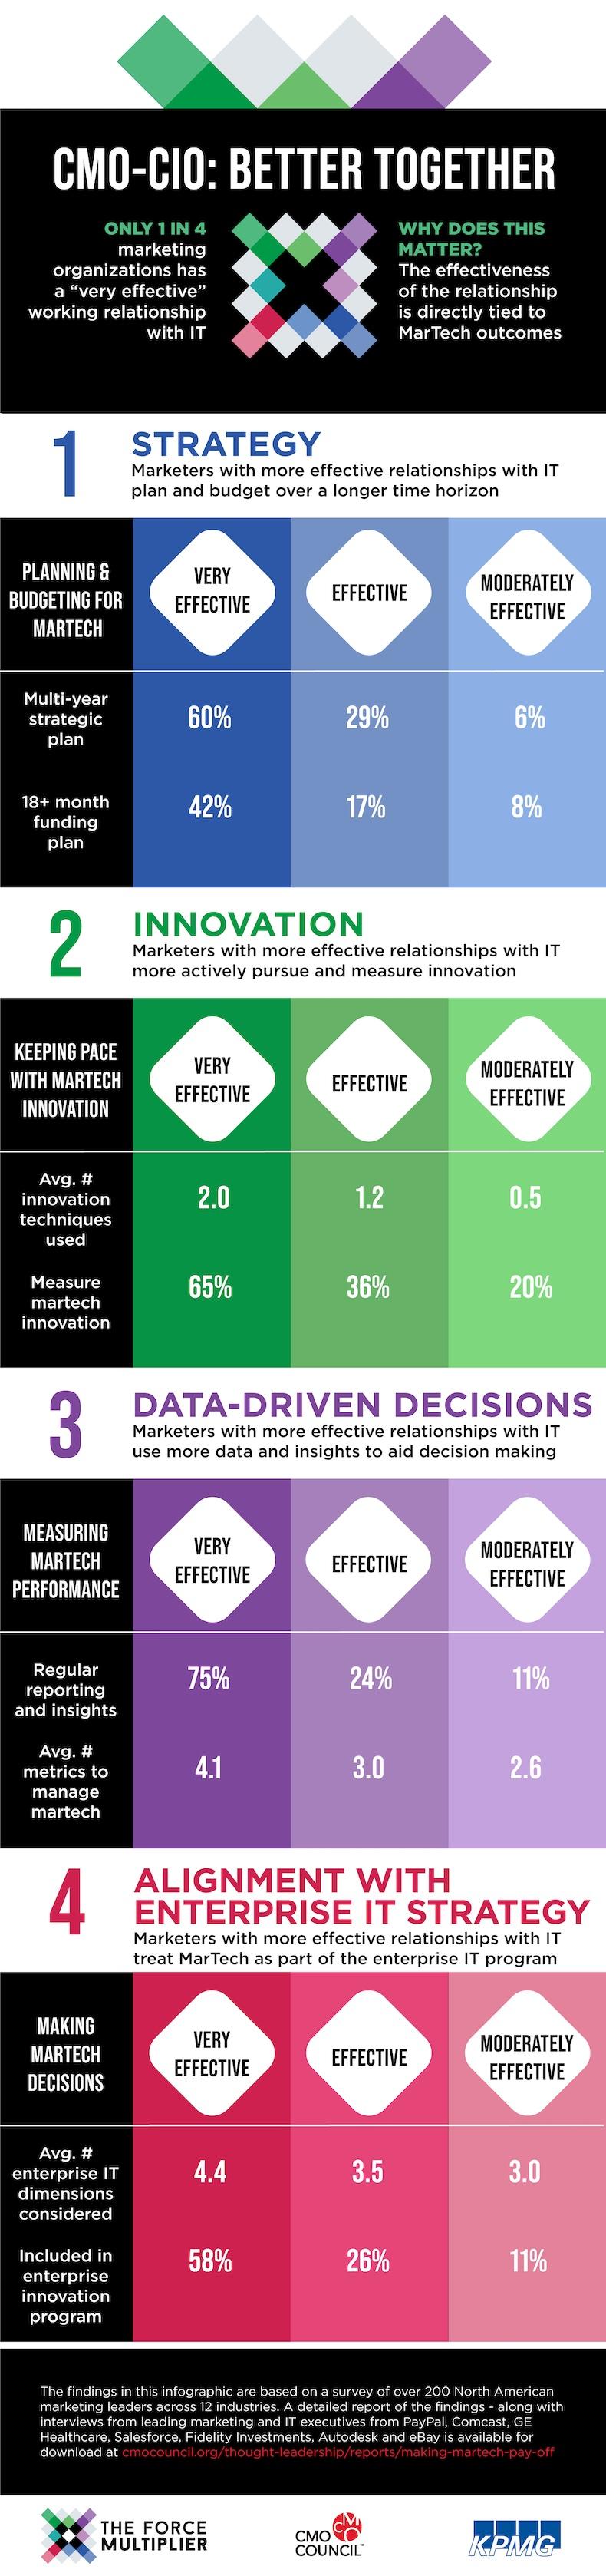 CMO-CIO relationship infographic